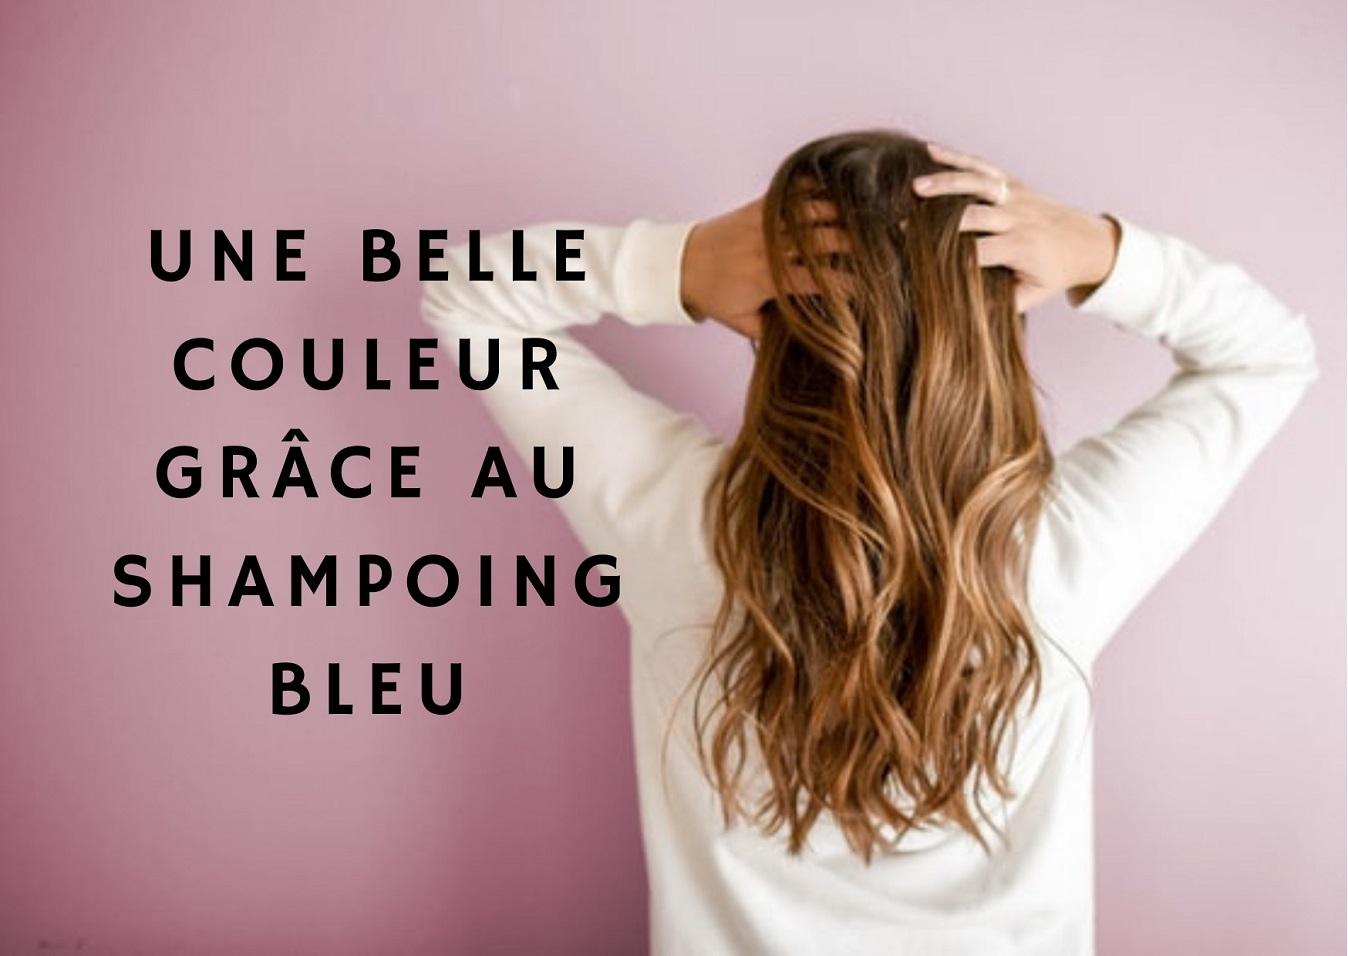 shampoing bleu